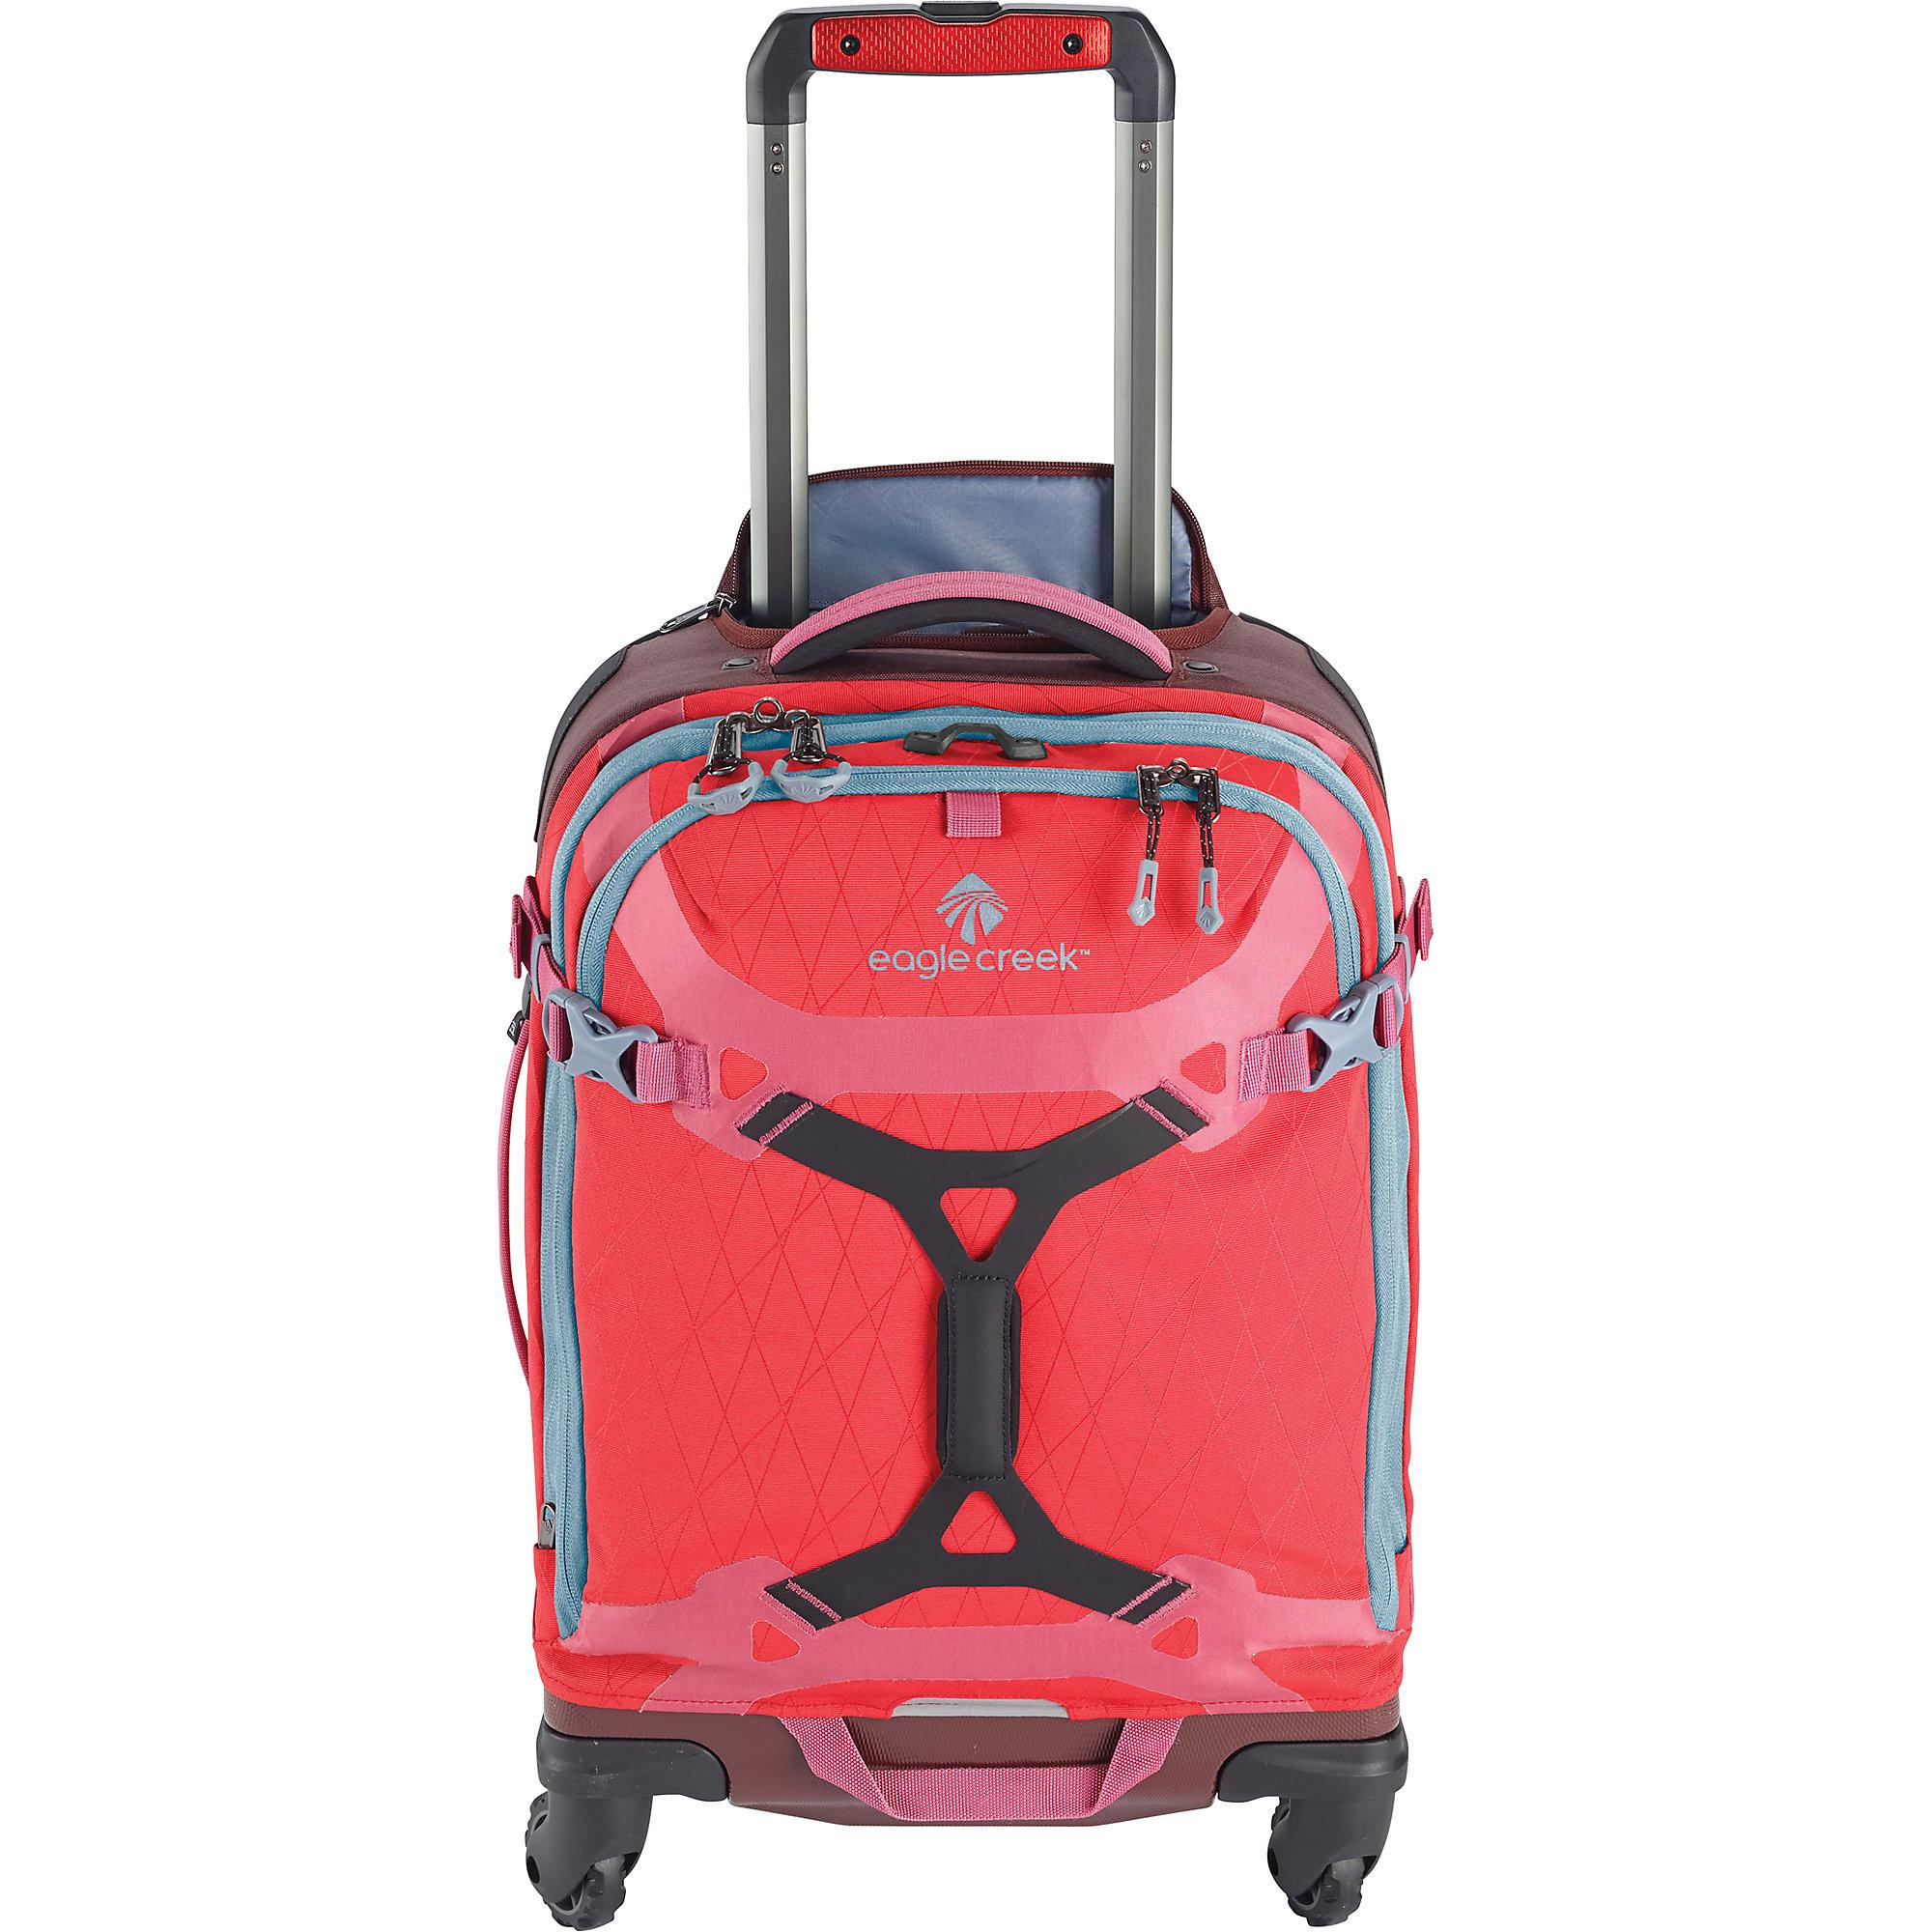 e57fec43c Eagle Creek Gear Warrior 4-wheel International Travel Pack in Pink ...